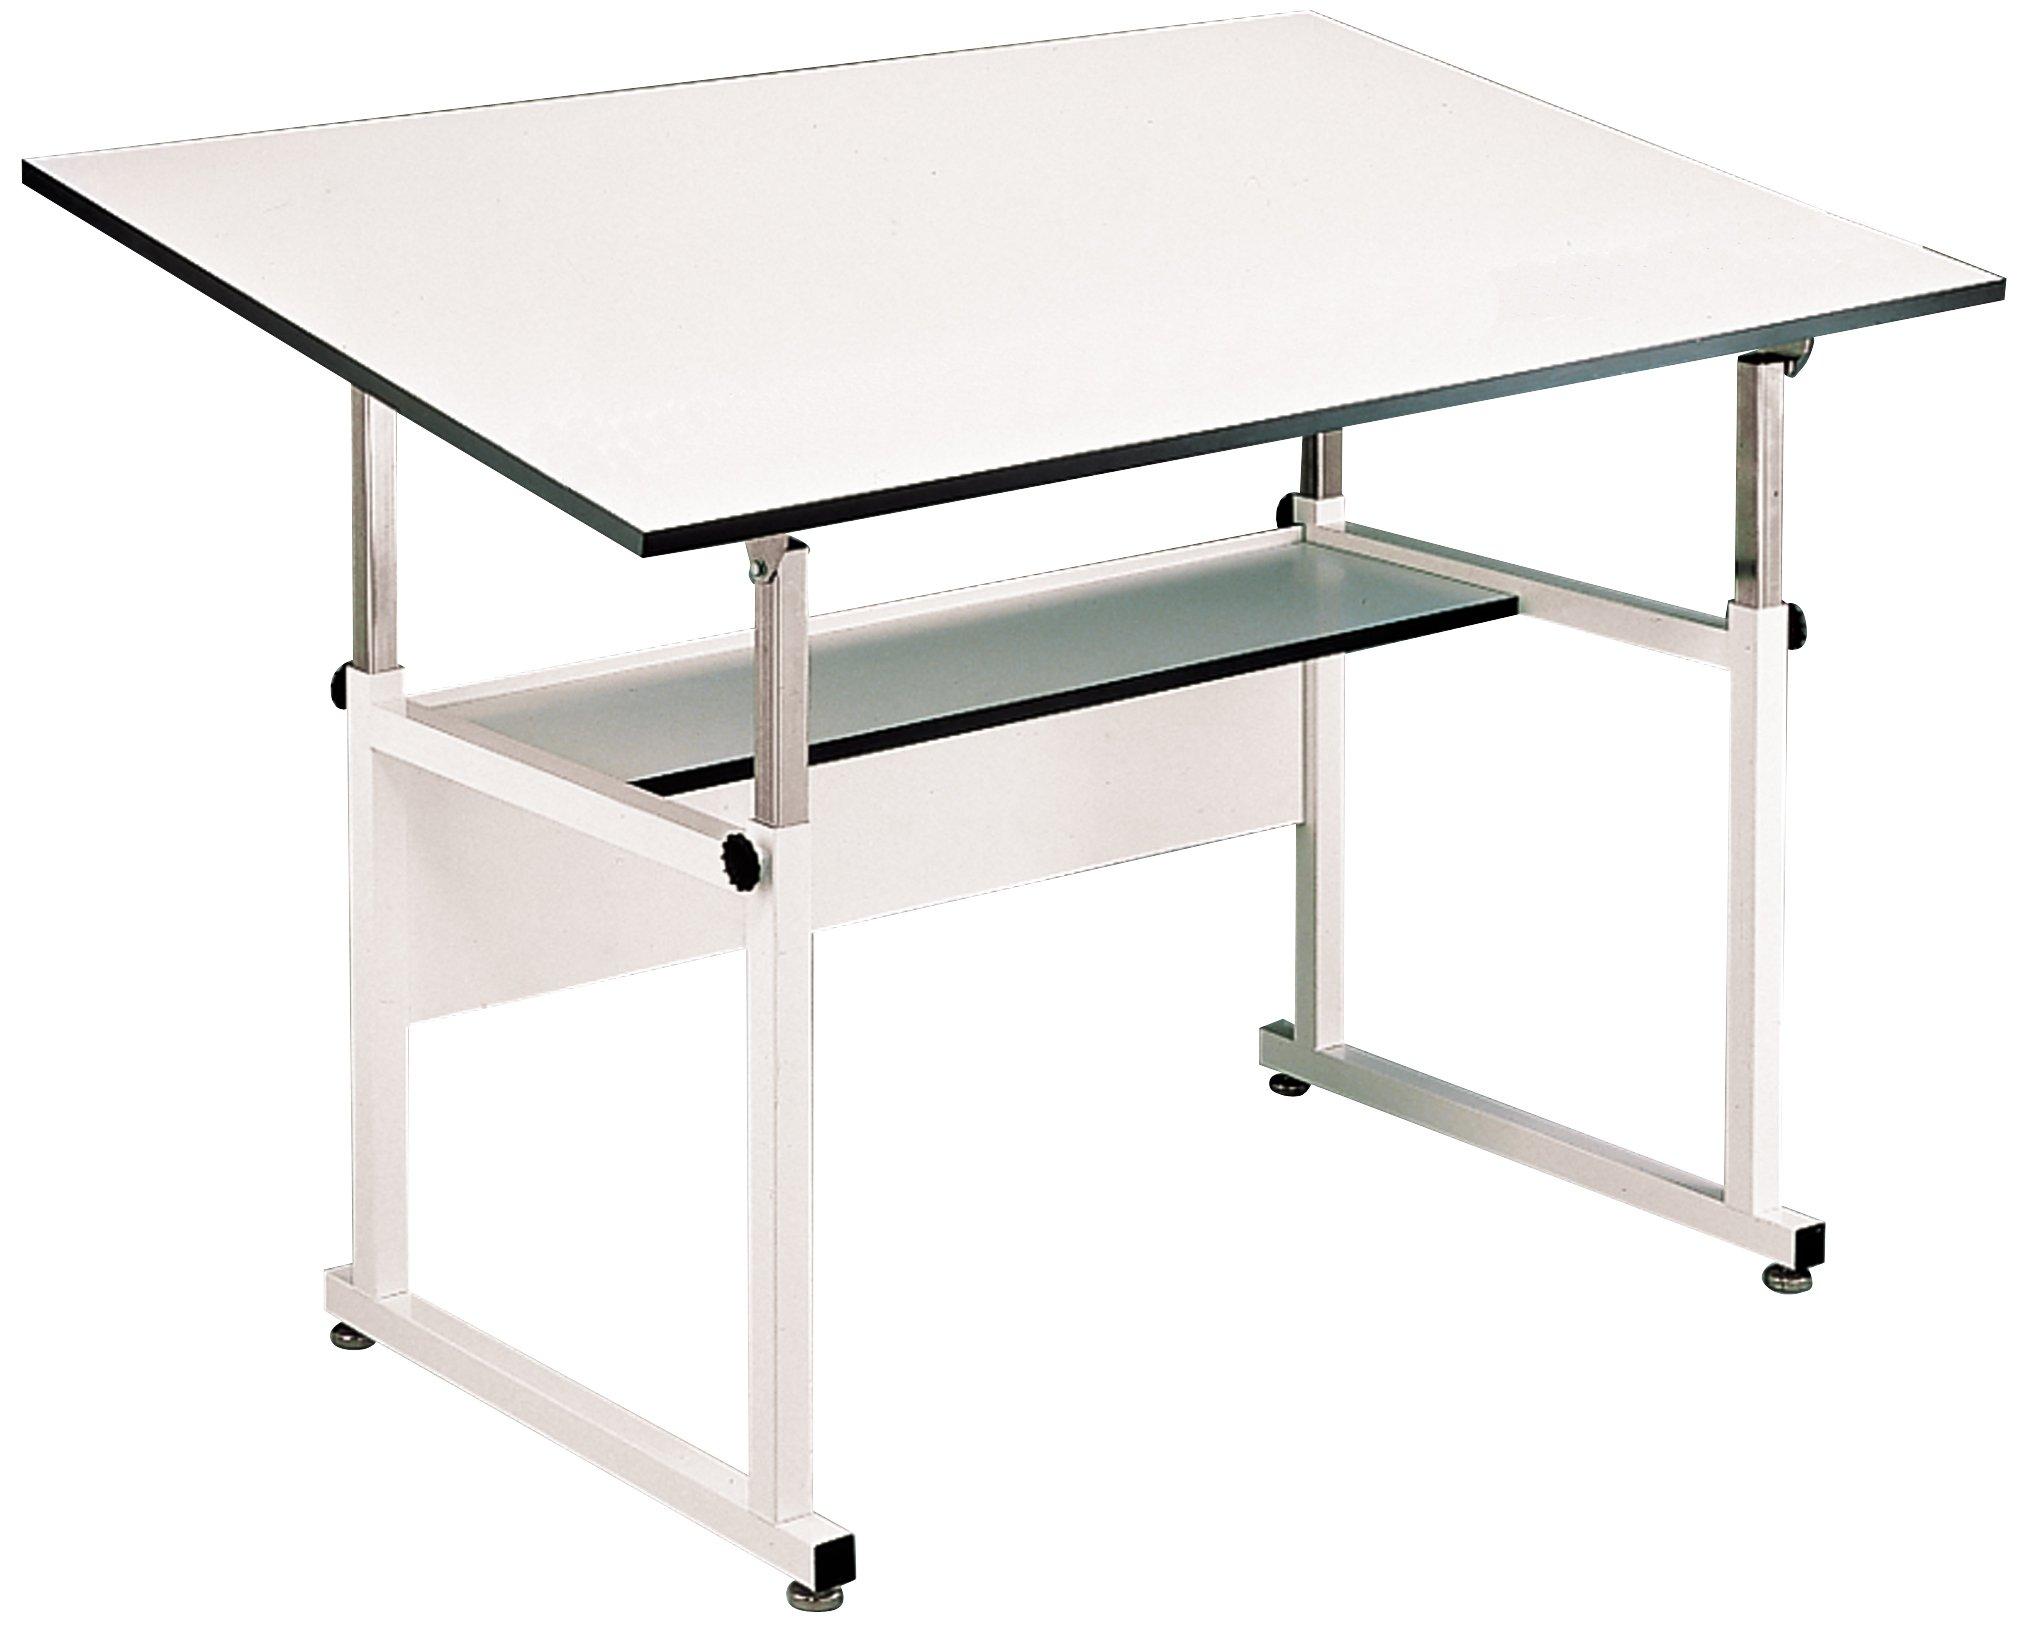 Alvin WM72-4-XB WorkMaster Table, White Base White Top 37 1/2 inches x 72 inches